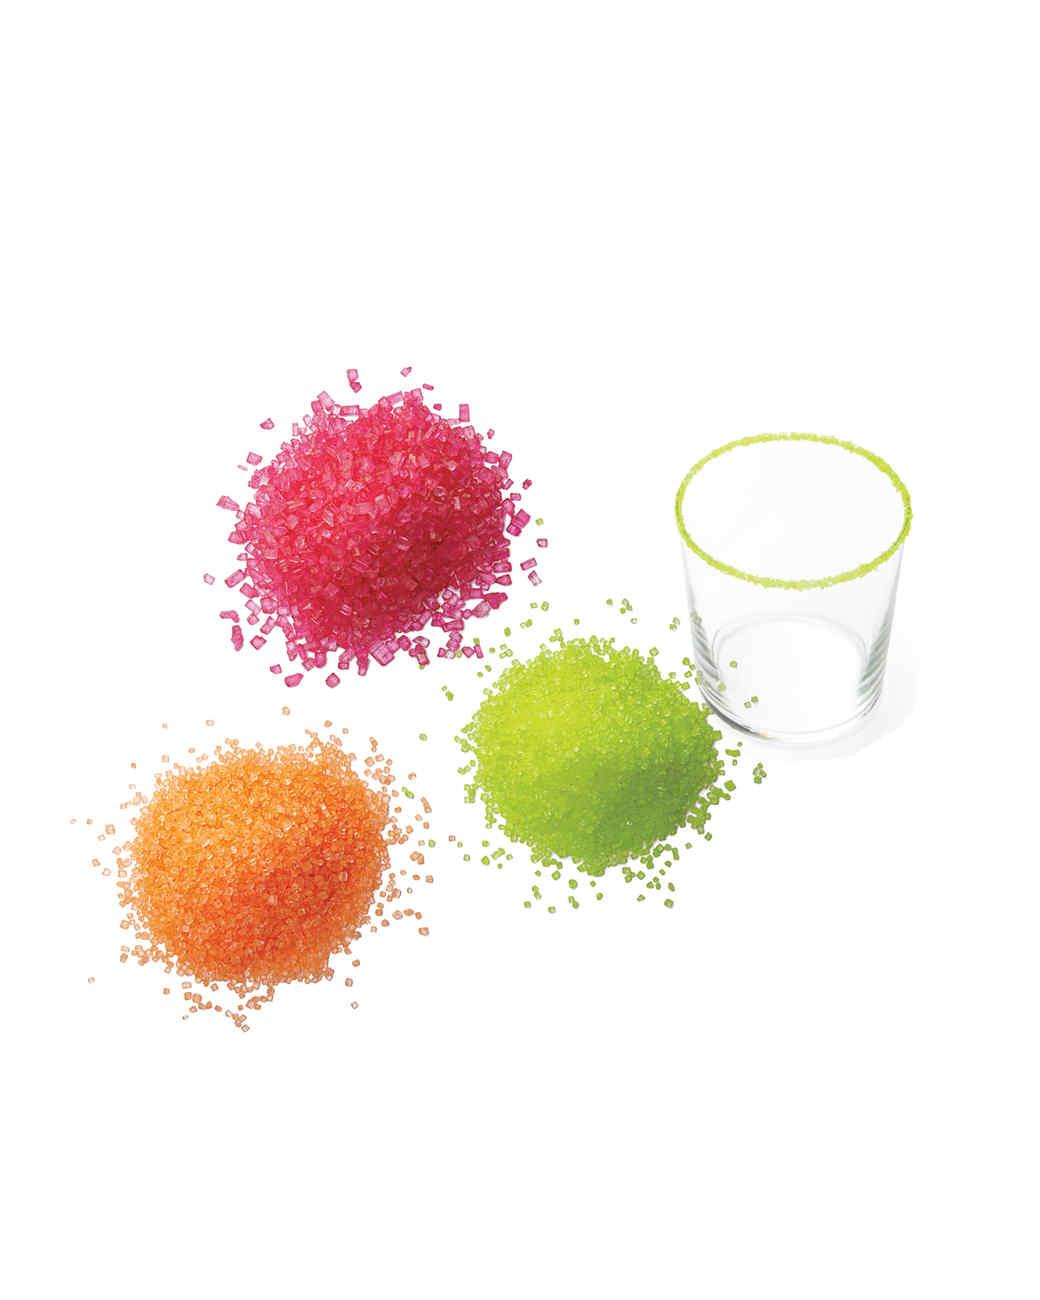 neon-sanding-sugar-md108414.jpg